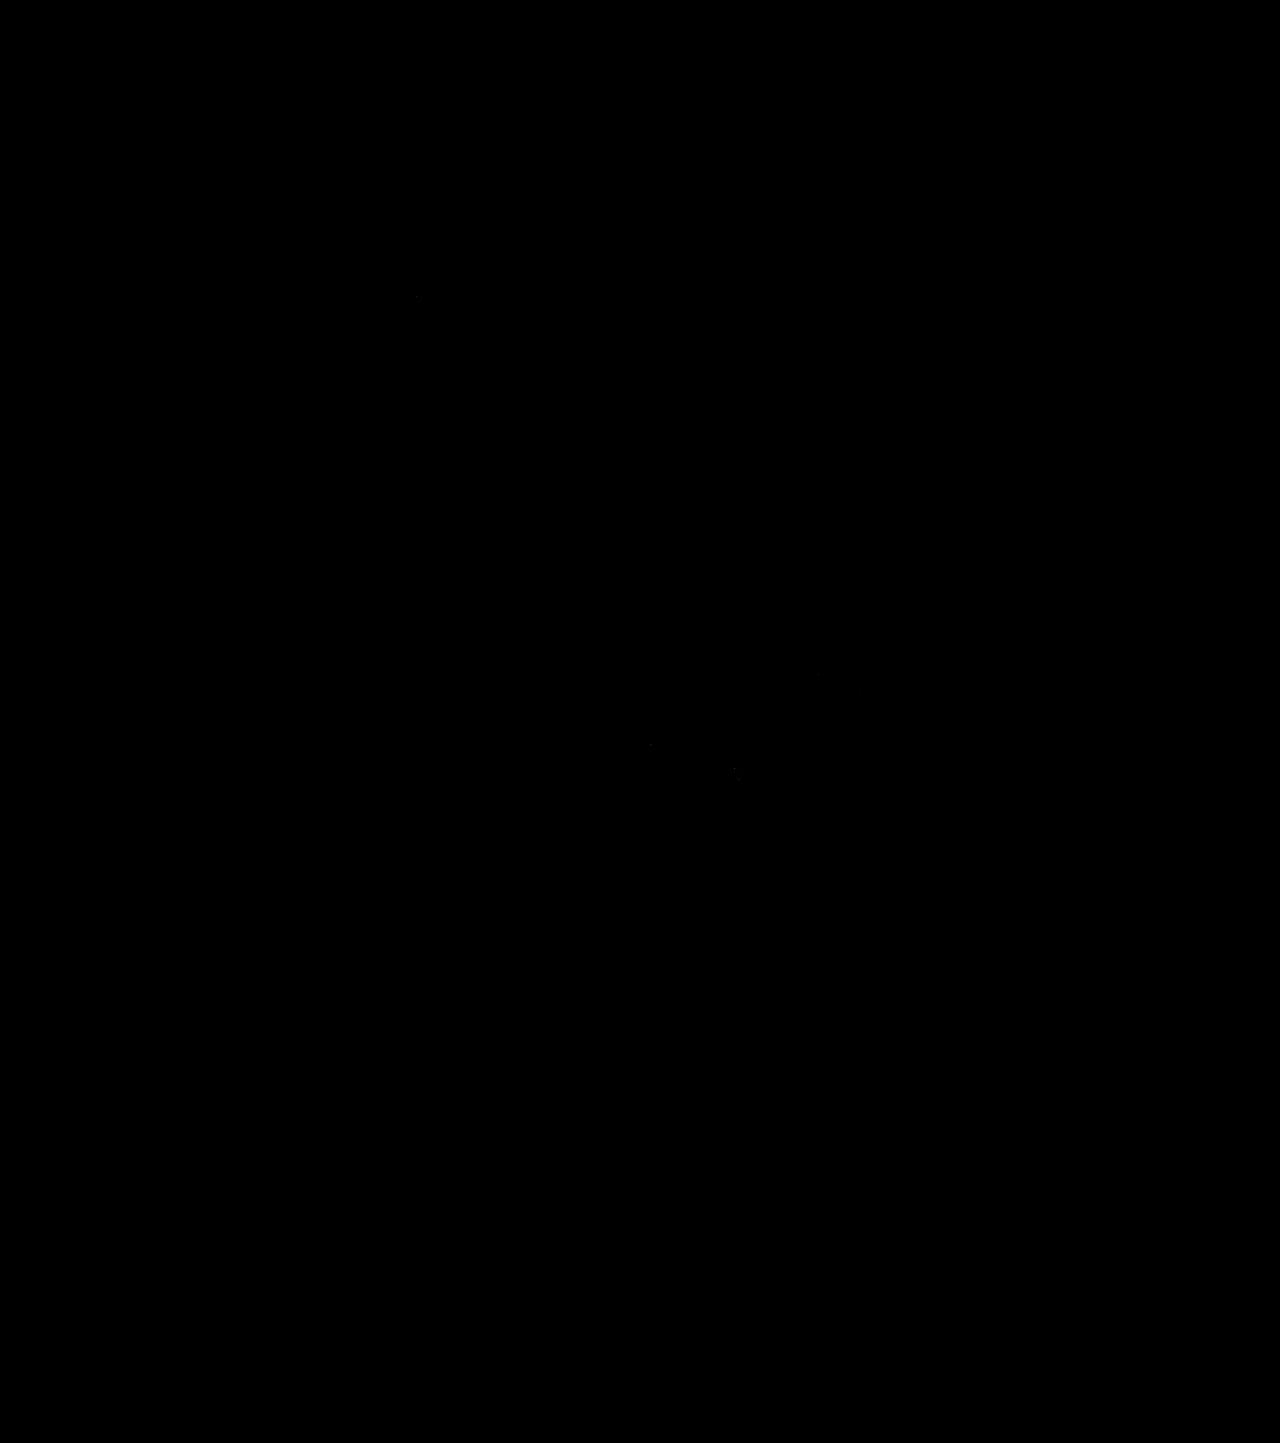 Naruto Shippuden Lineart : Naruto shippuden ending lineart by rosolinio on deviantart